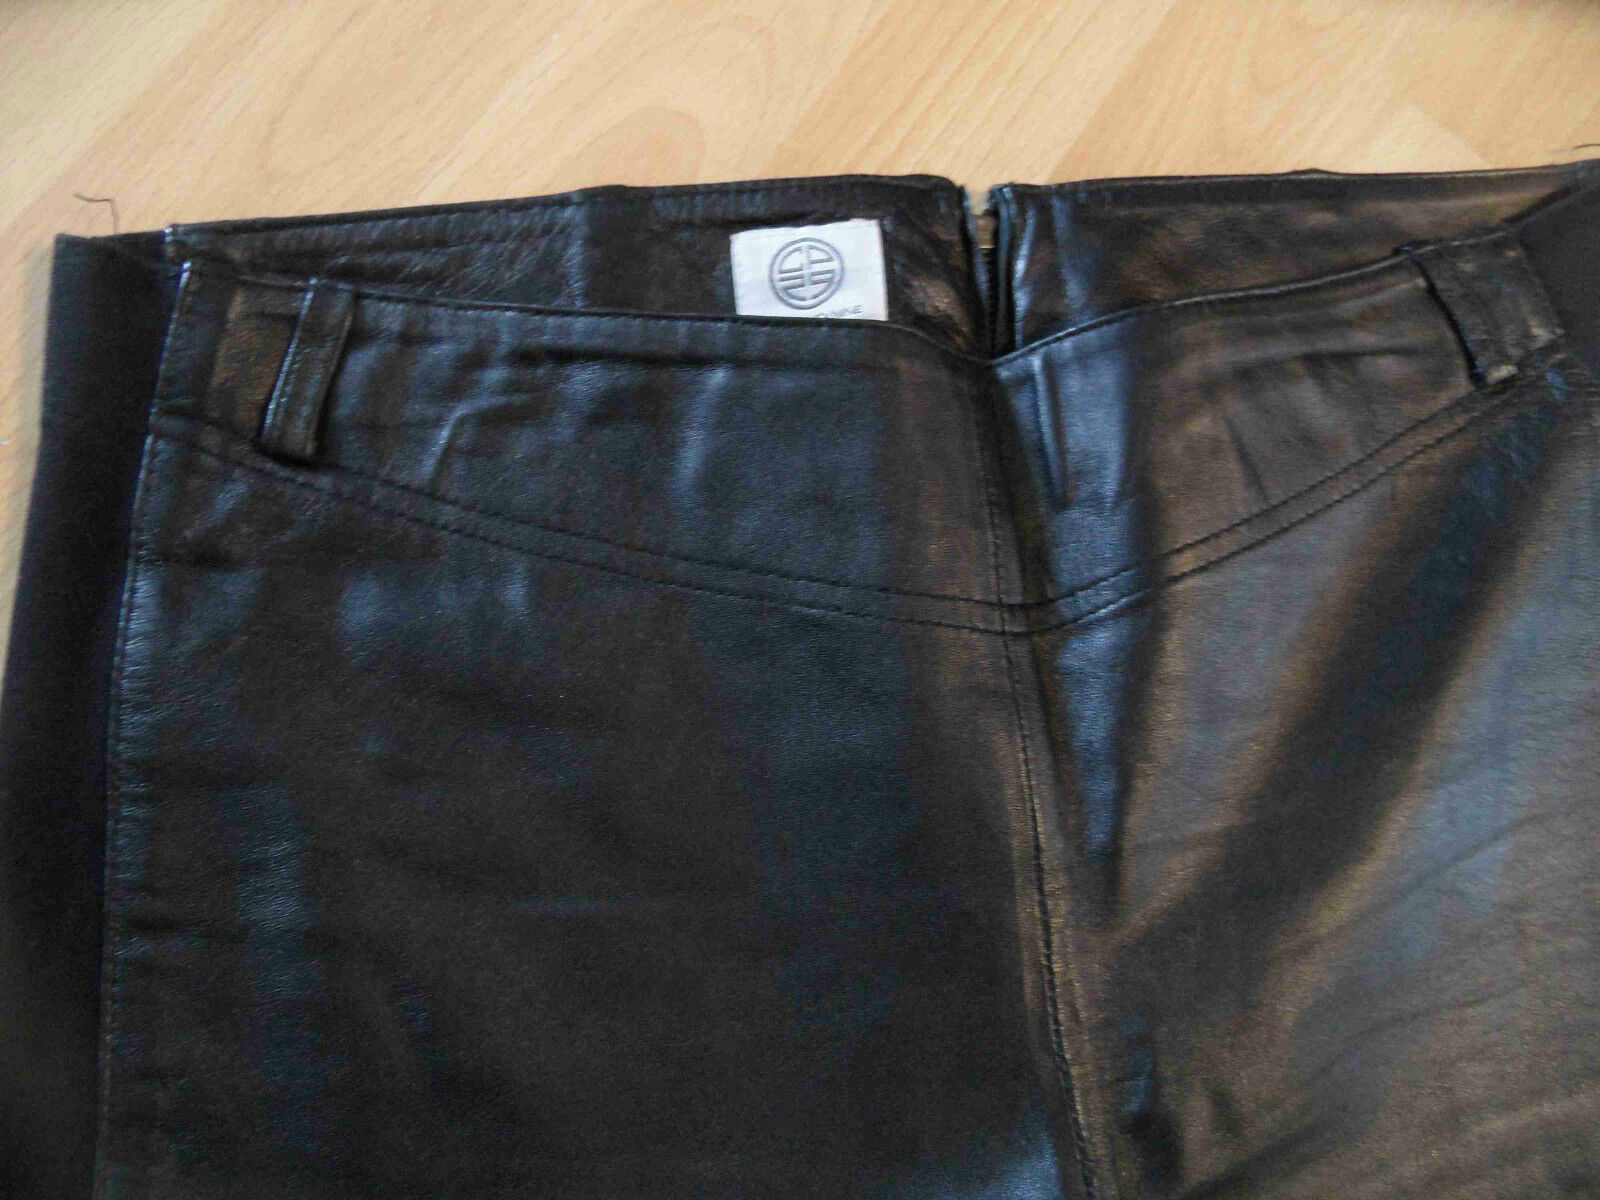 CP29 TWENTYNINE stylische Lederhose Lederleggings schwarz Gr. 38 38 38 40 NEU fca00f